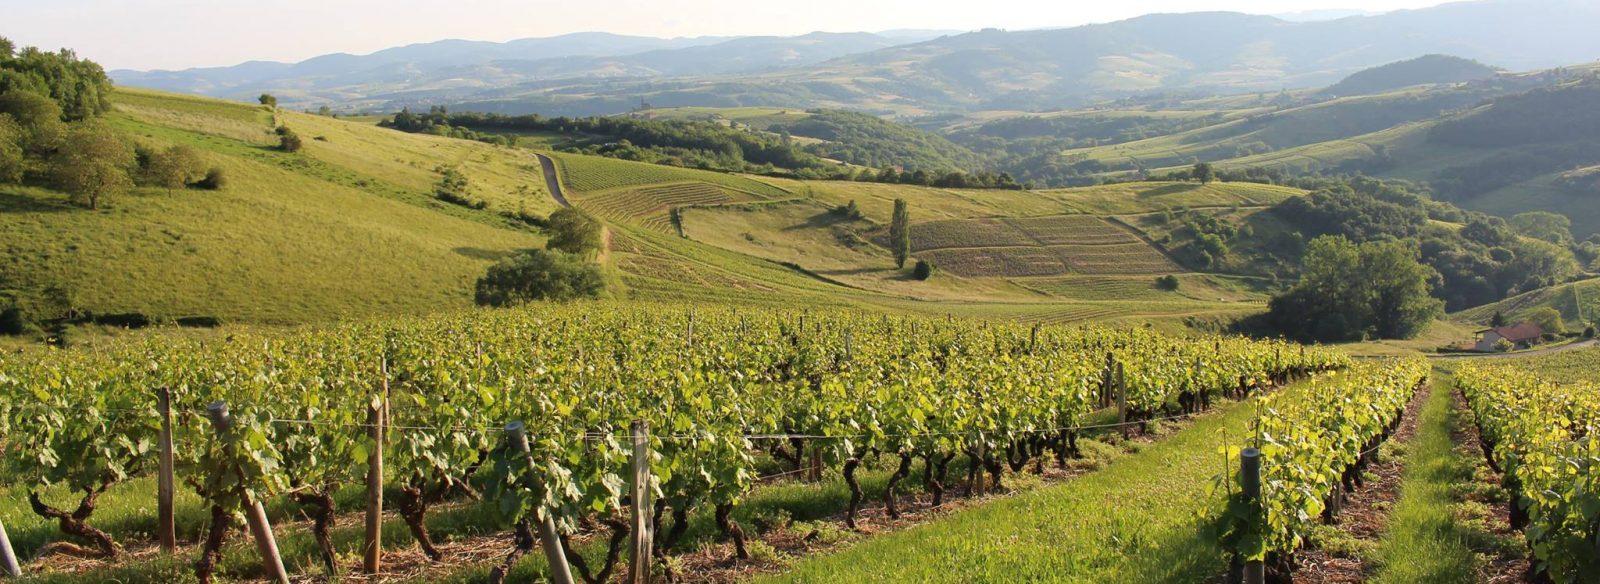 Mâconnais y Beaujolais, donde nacen los vinos más asequibles de Borgoña